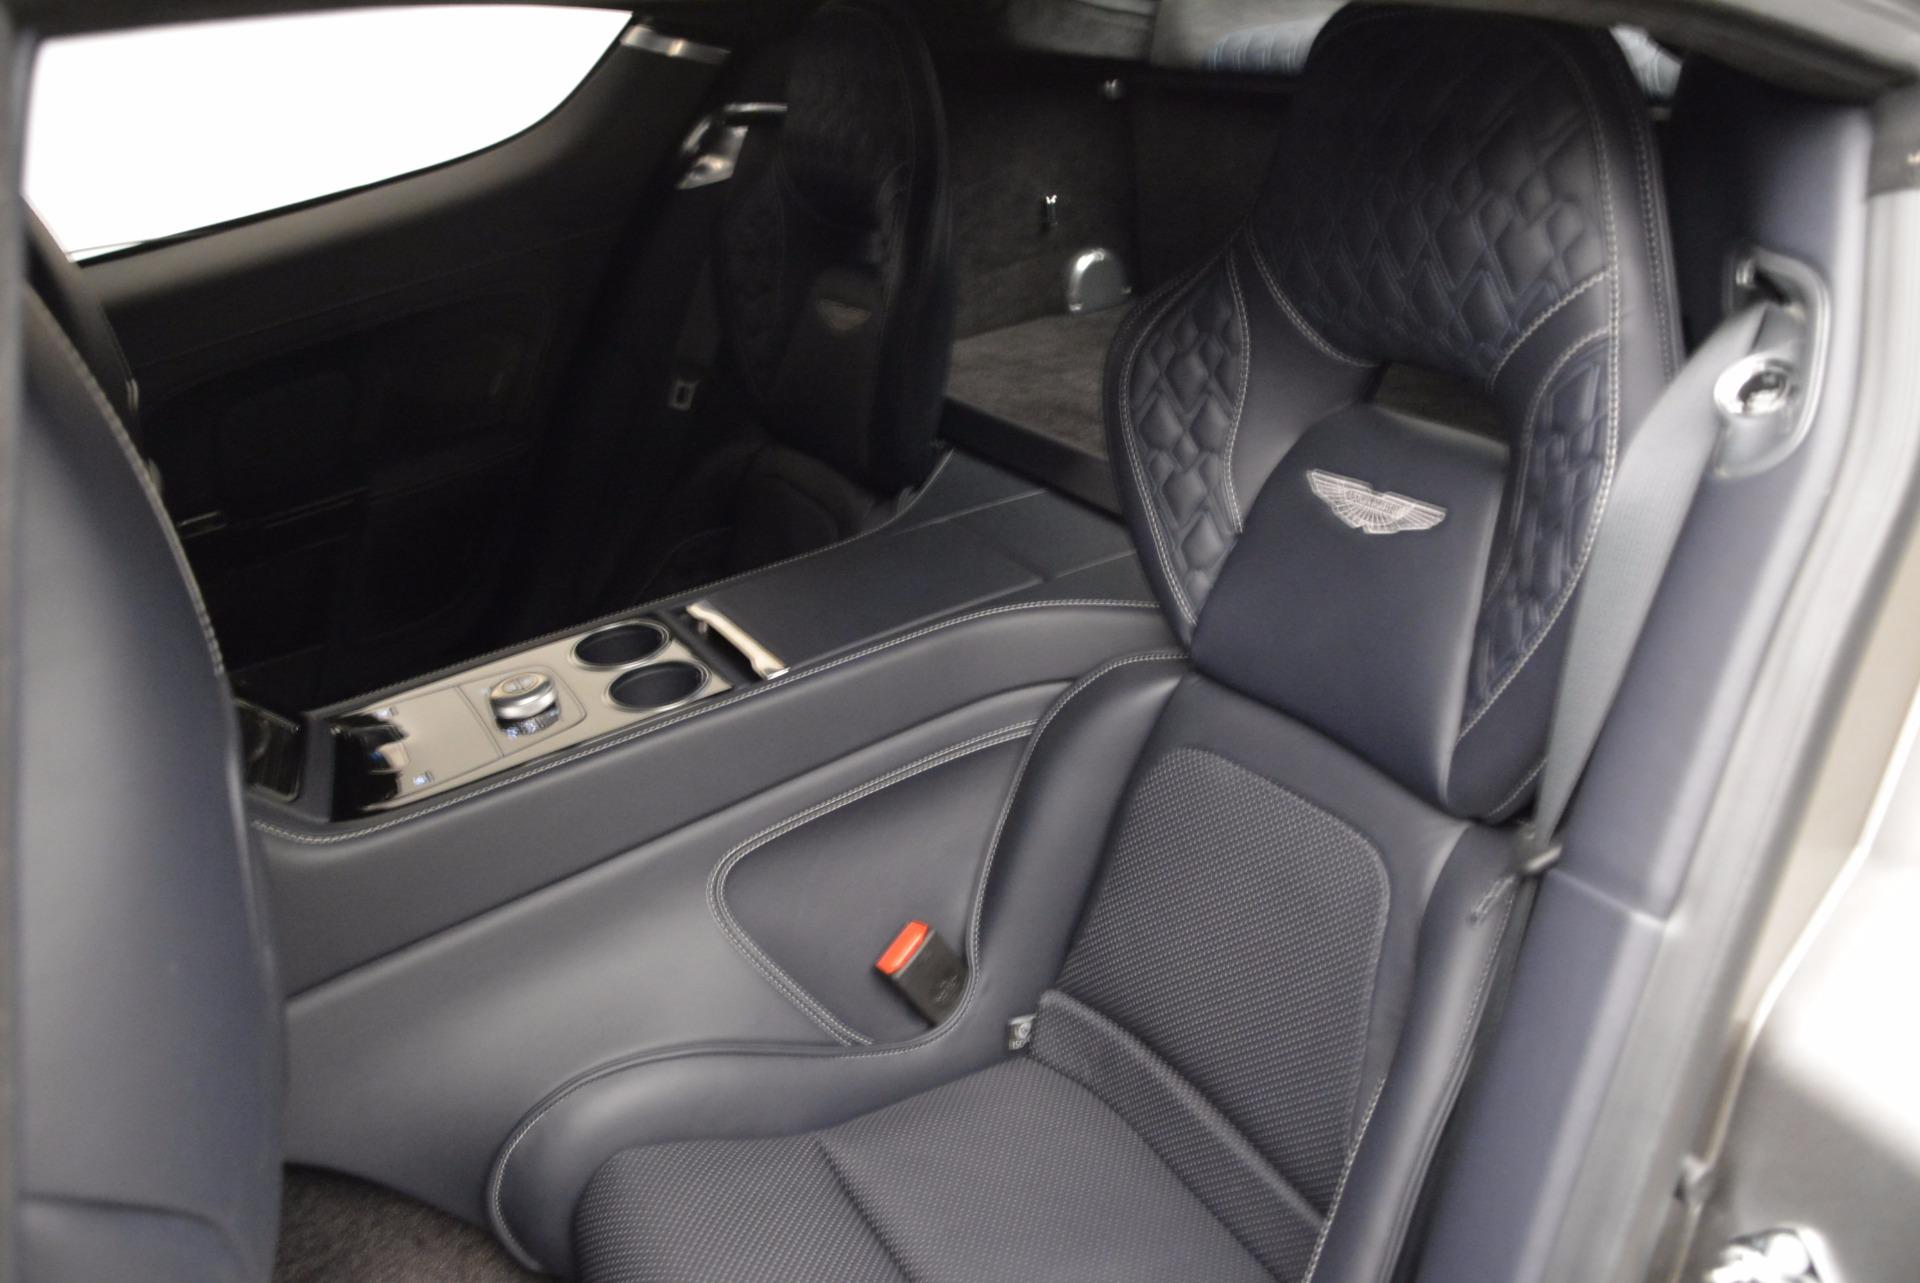 Used 2017 Aston Martin Rapide S Sedan For Sale In Greenwich, CT 1843_p19